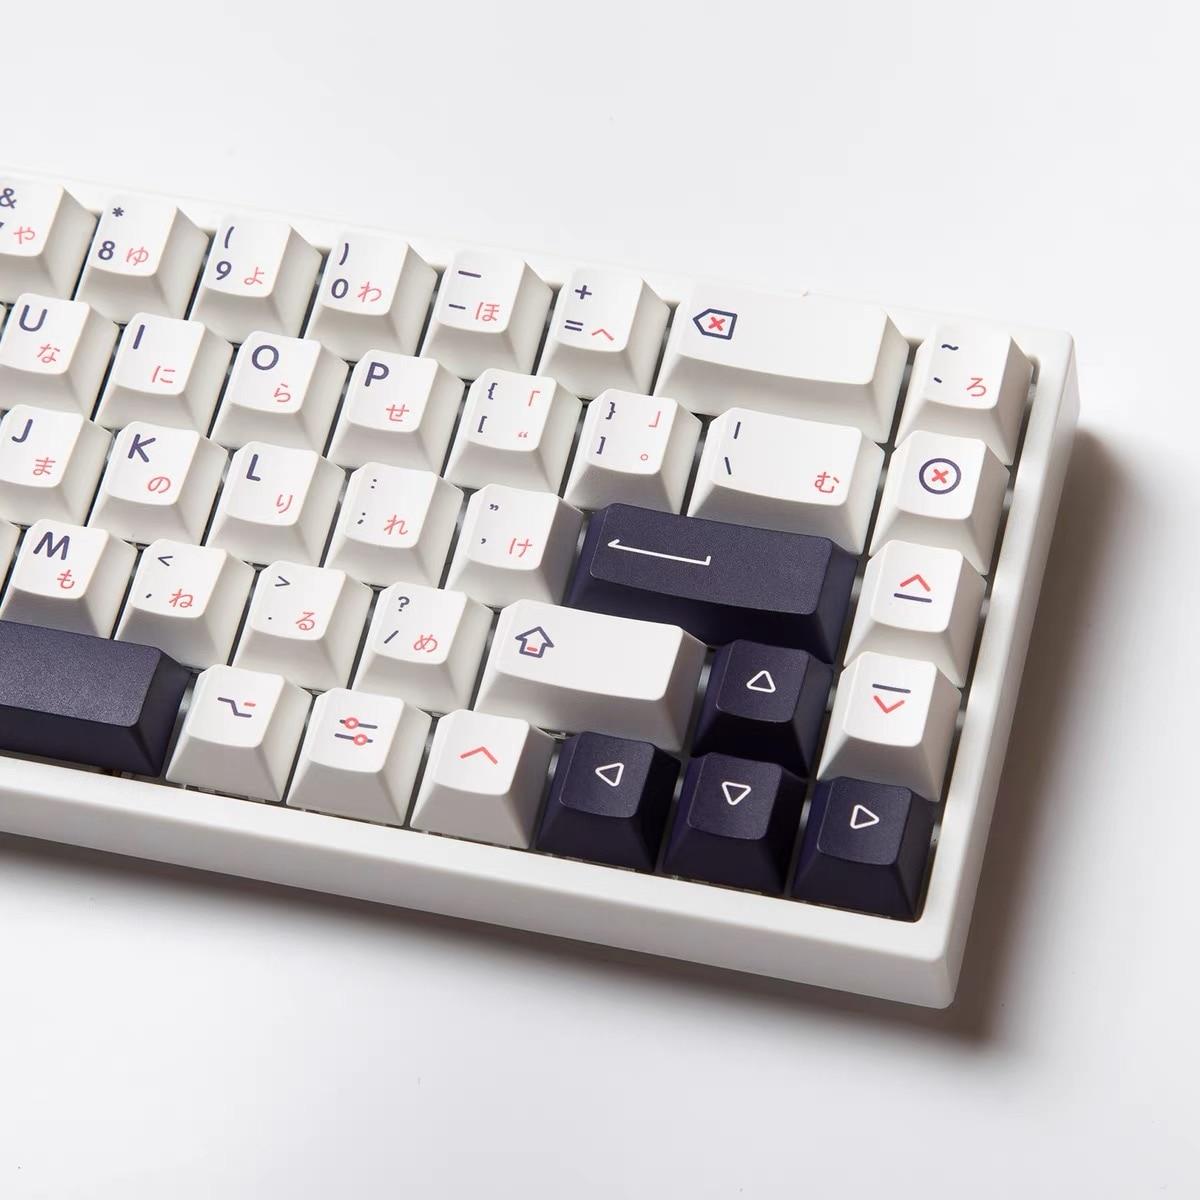 Колпачки для клавиш PBT 139, черные и белые колпачки для механической клавиатуры GMMK Pro